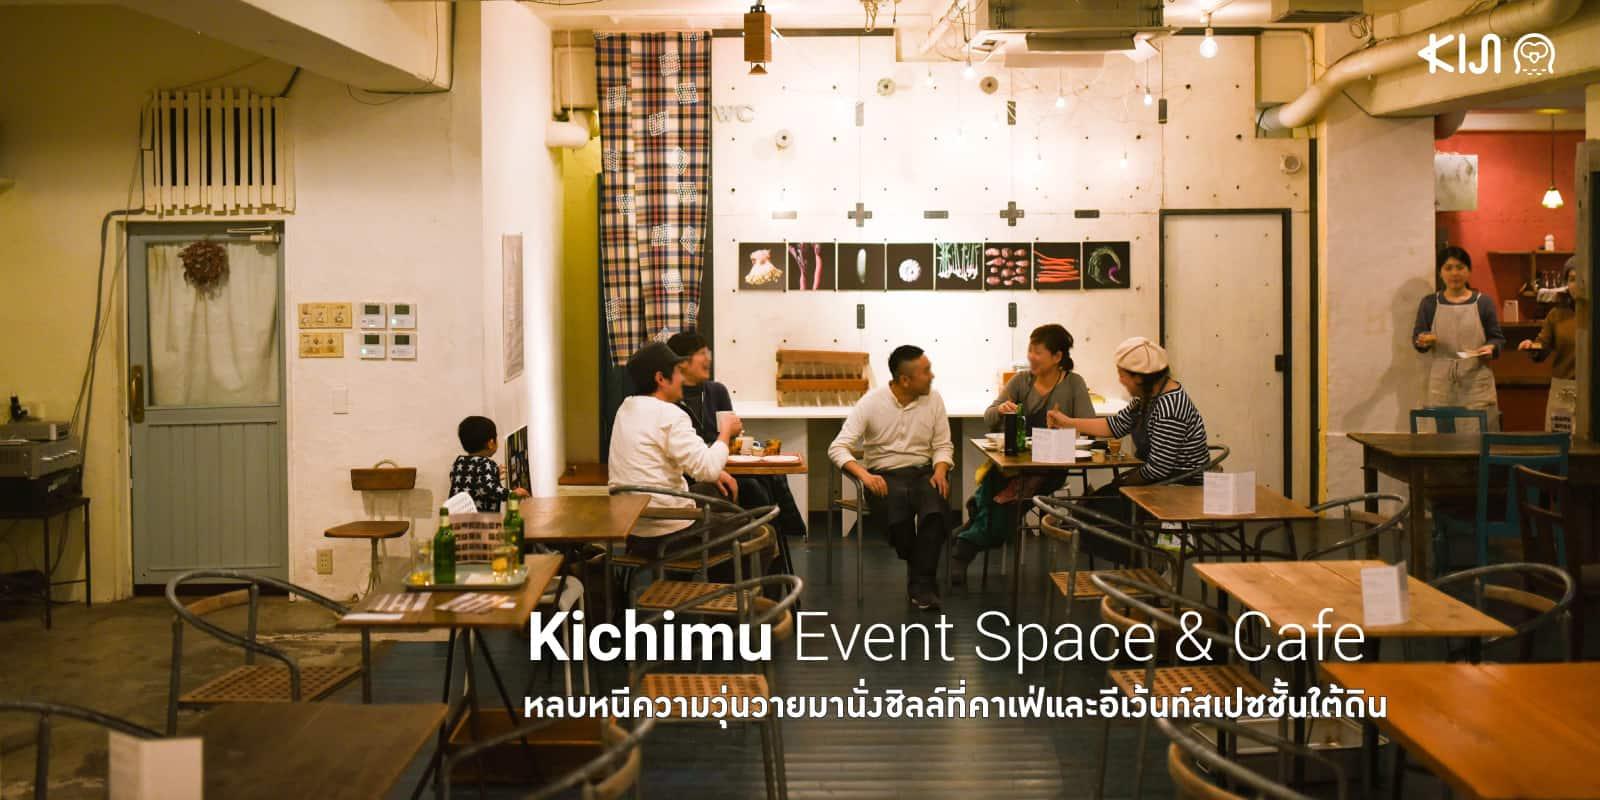 Kichimu Event Space & Cafe ในย่านคิชิโจจิ